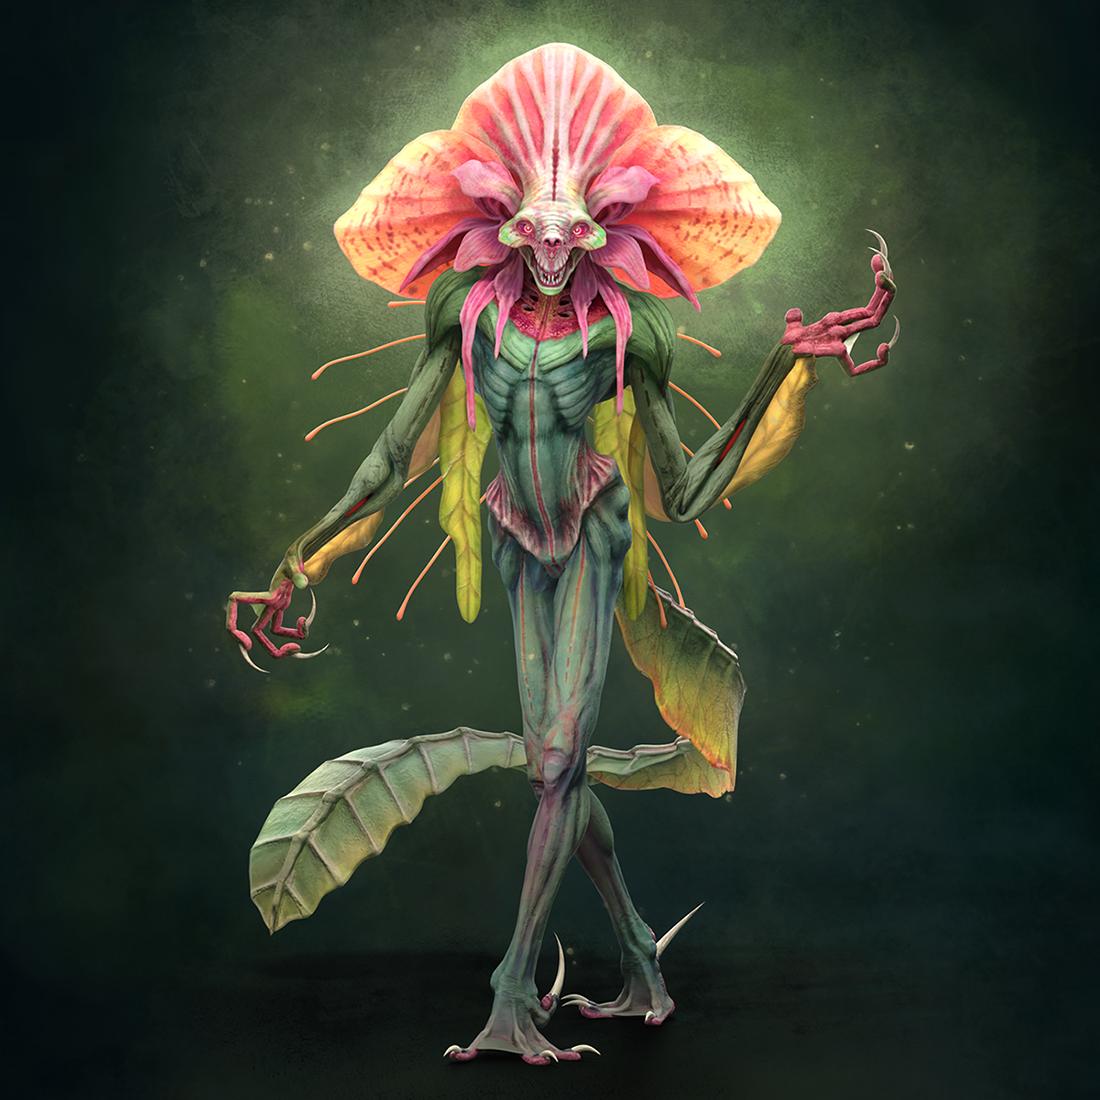 A lizard-like character designed by Noah Mesh.